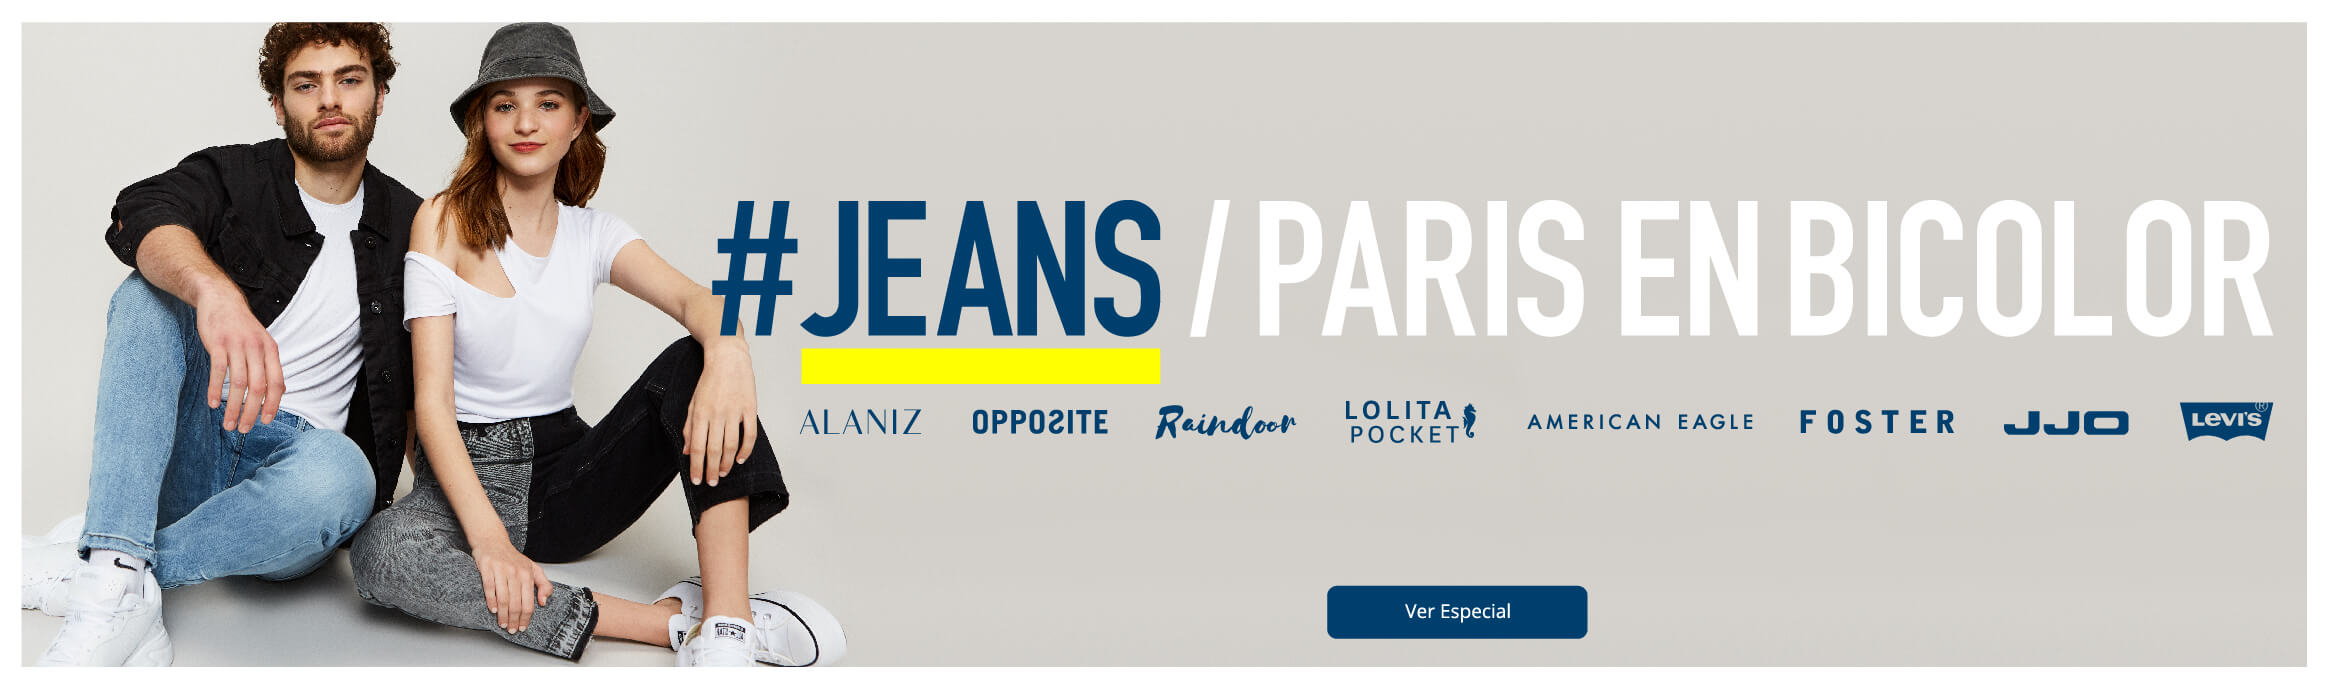 Especial Jeans